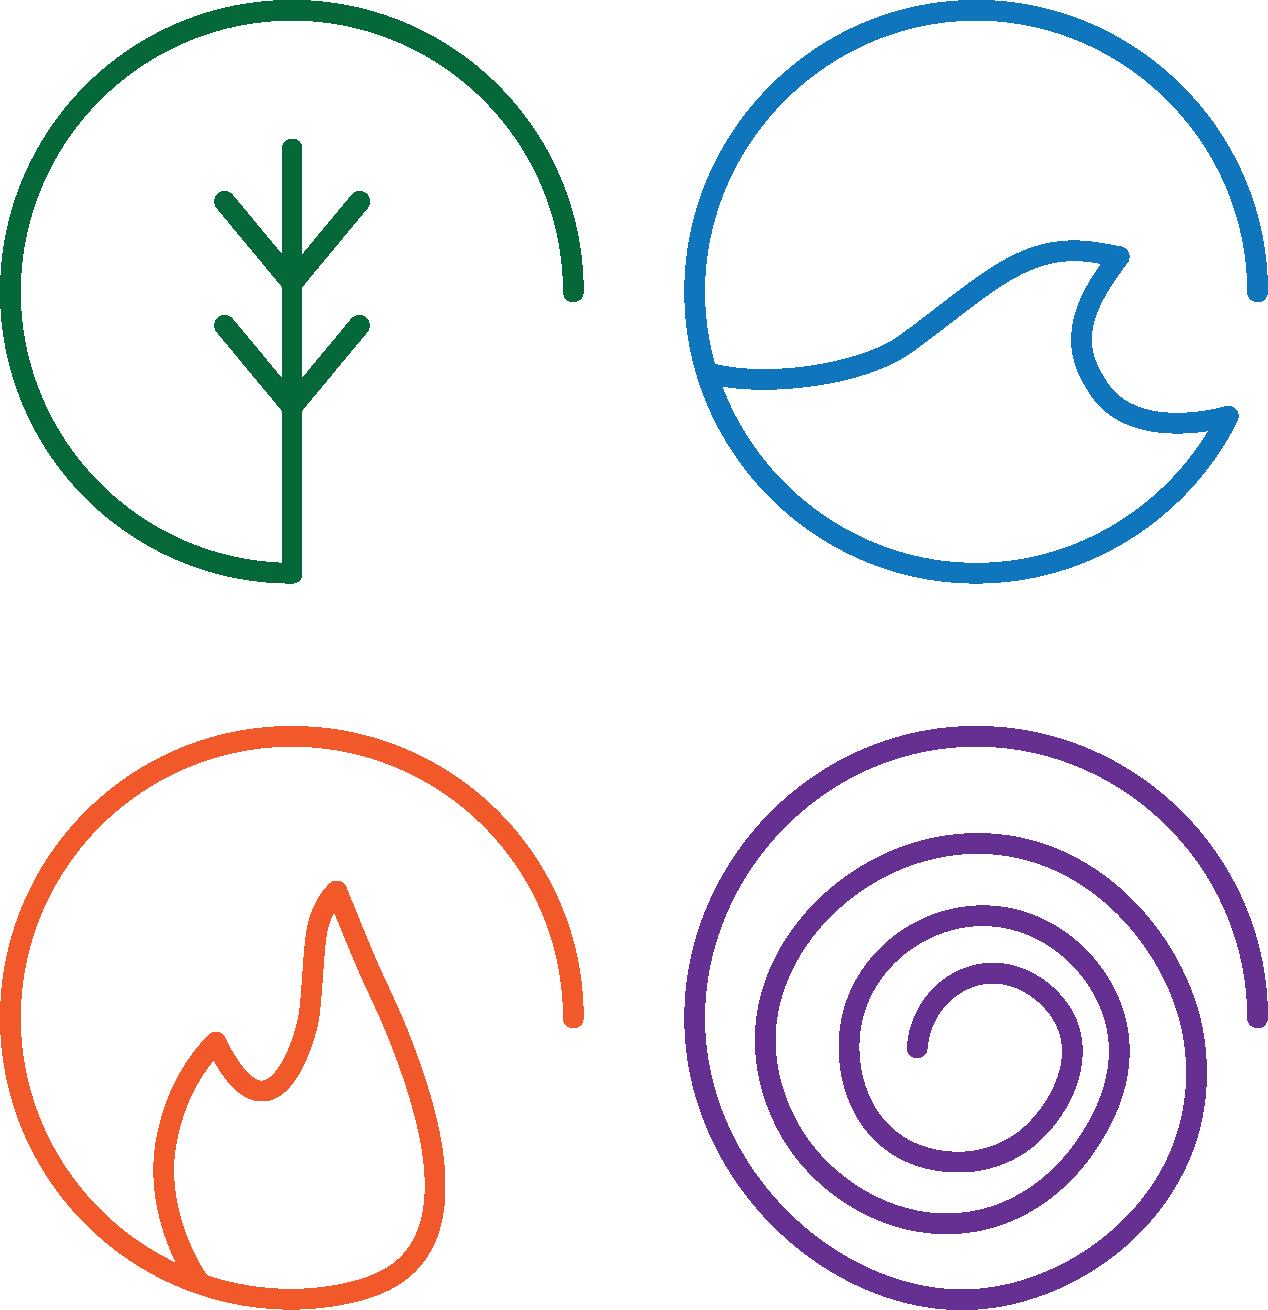 Elements of Elder Care LLC